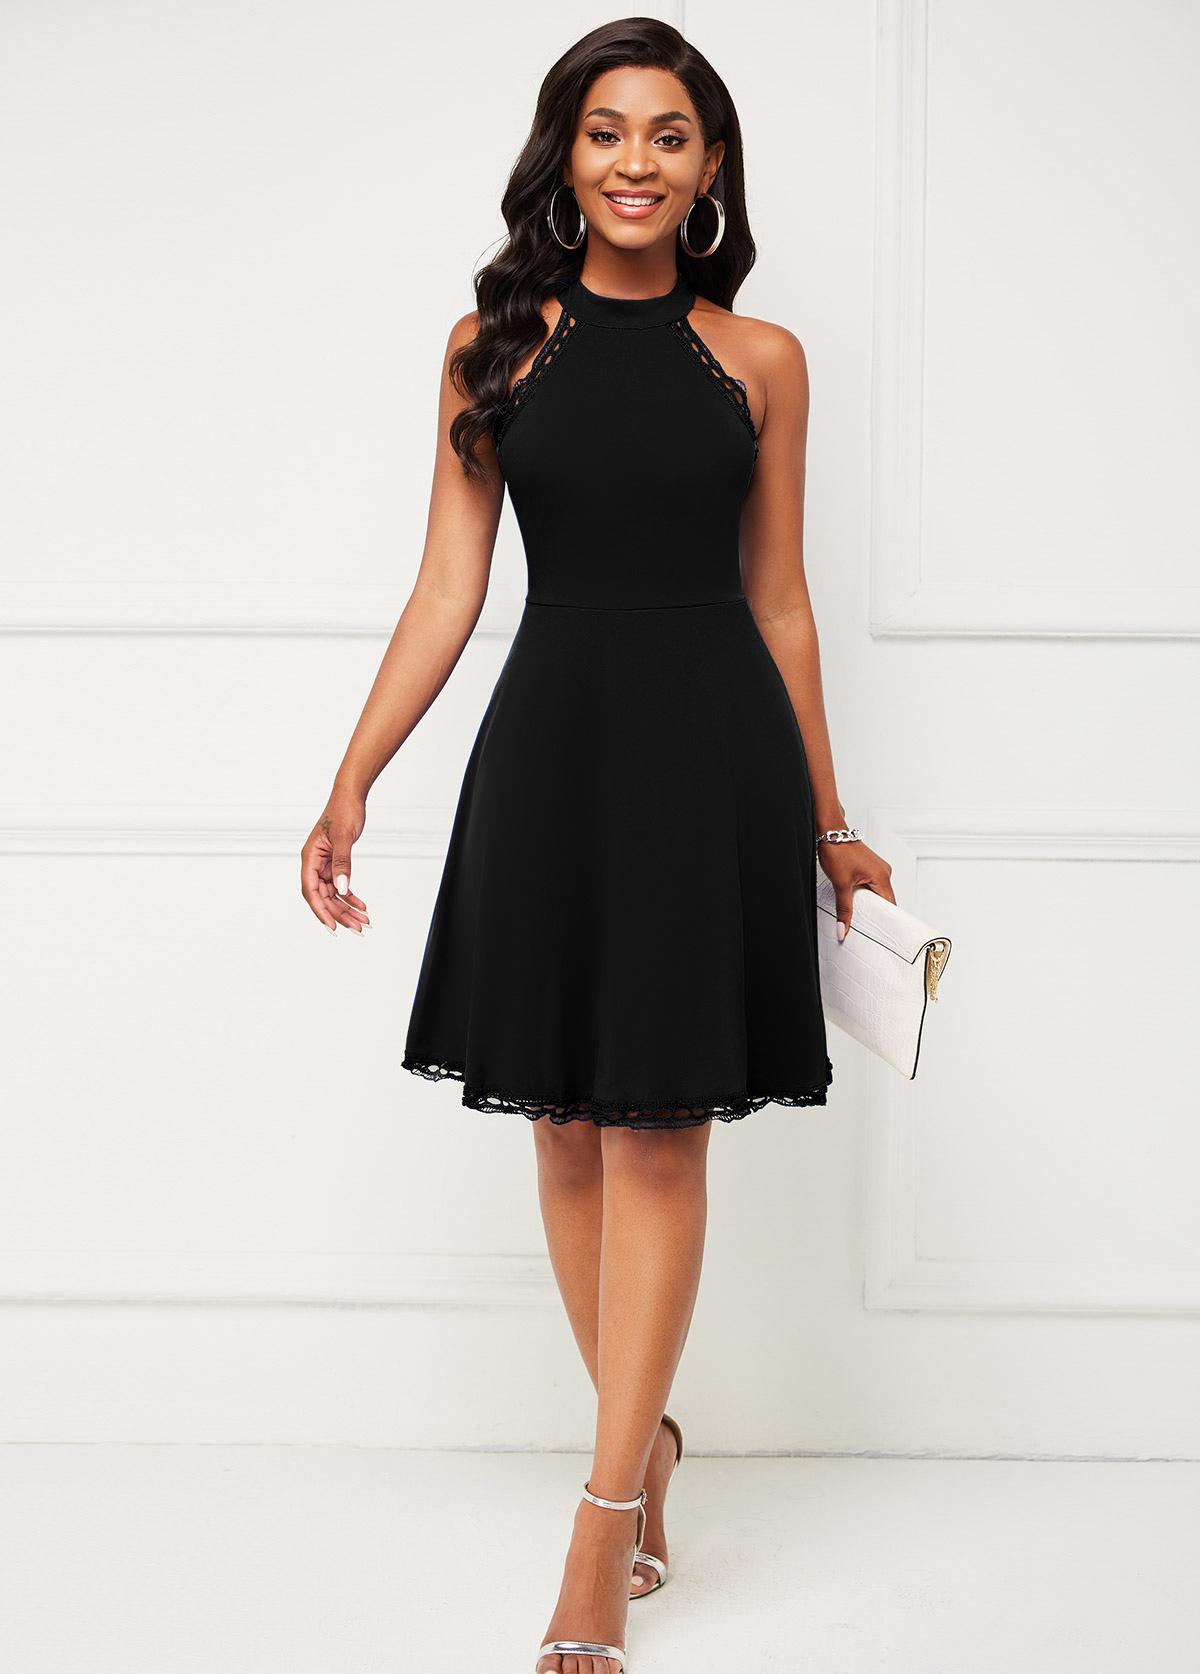 Zipper Closure Black Sleeveless Halter Dress